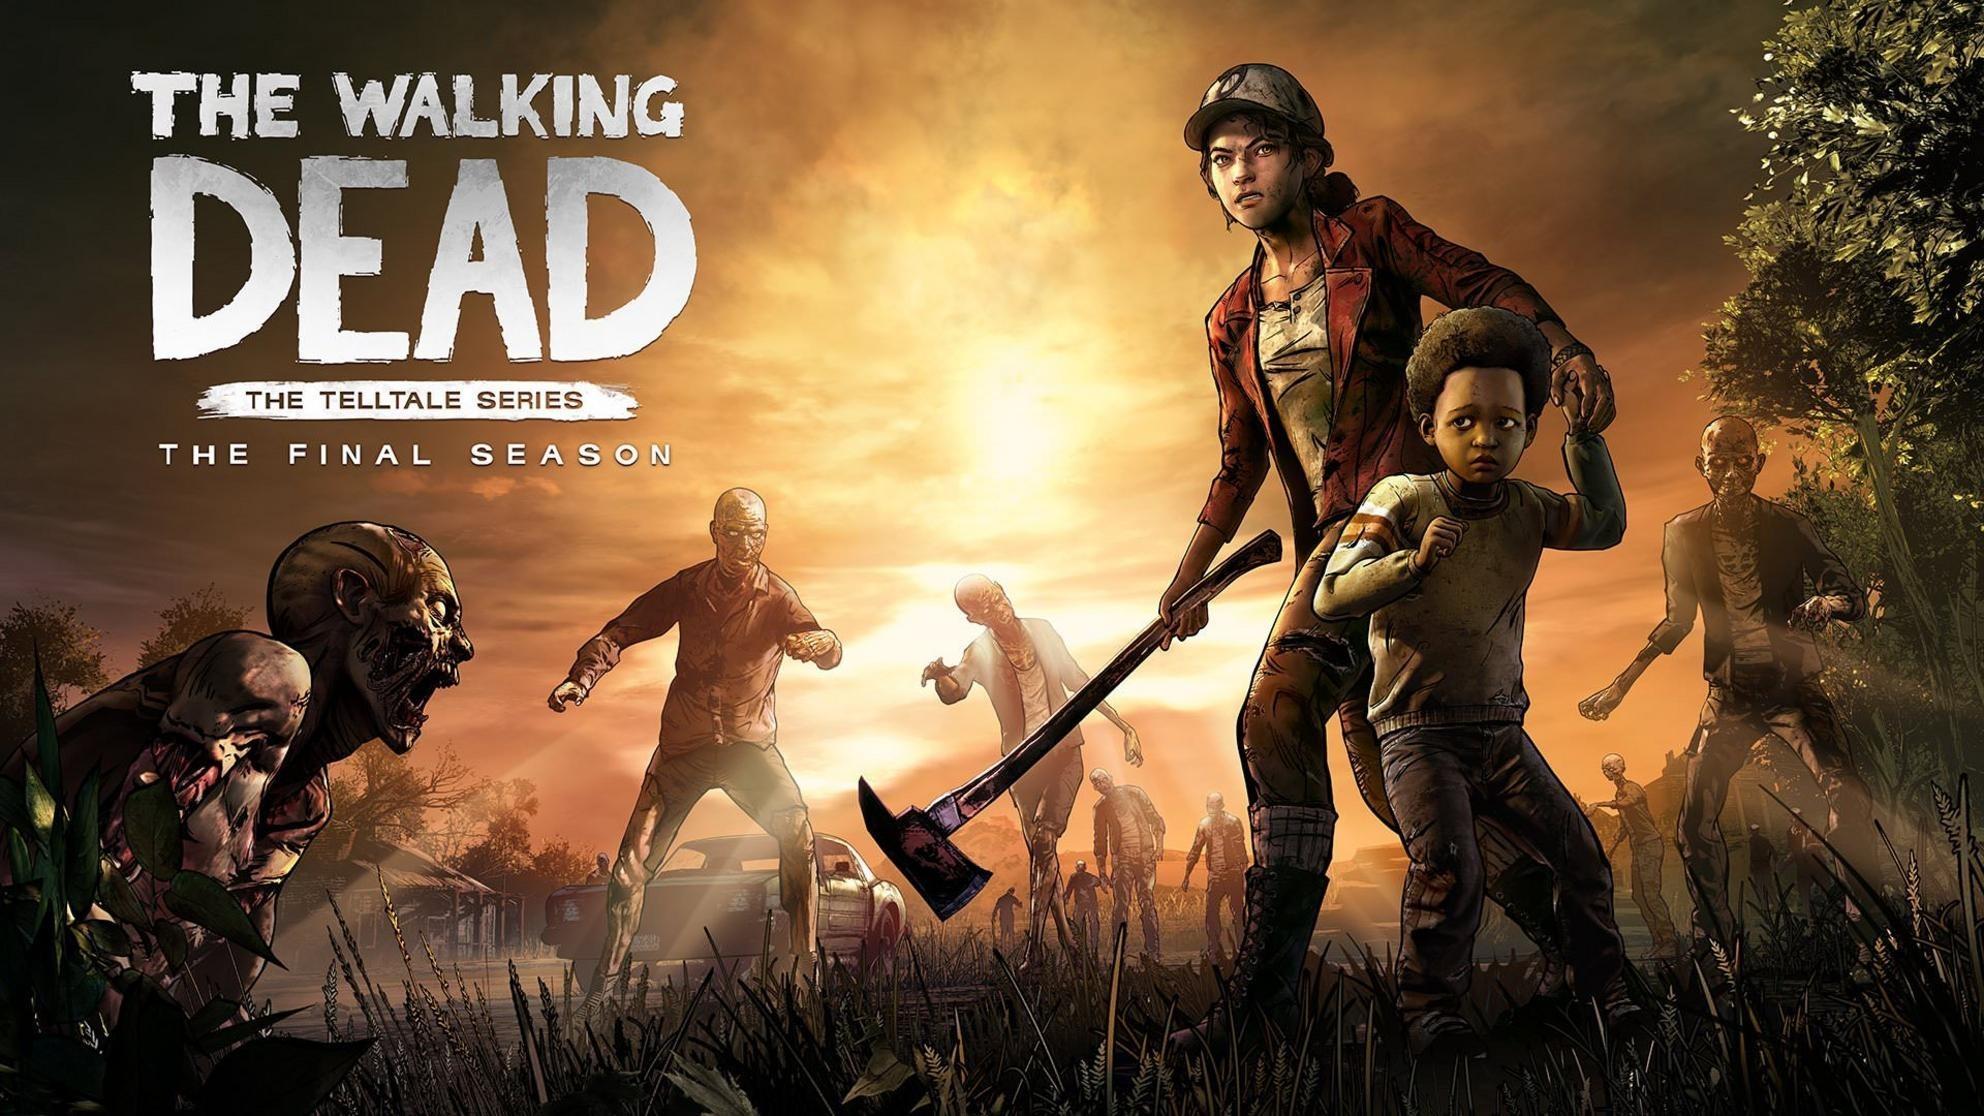 The Walking Dead: The Final Season is coming!